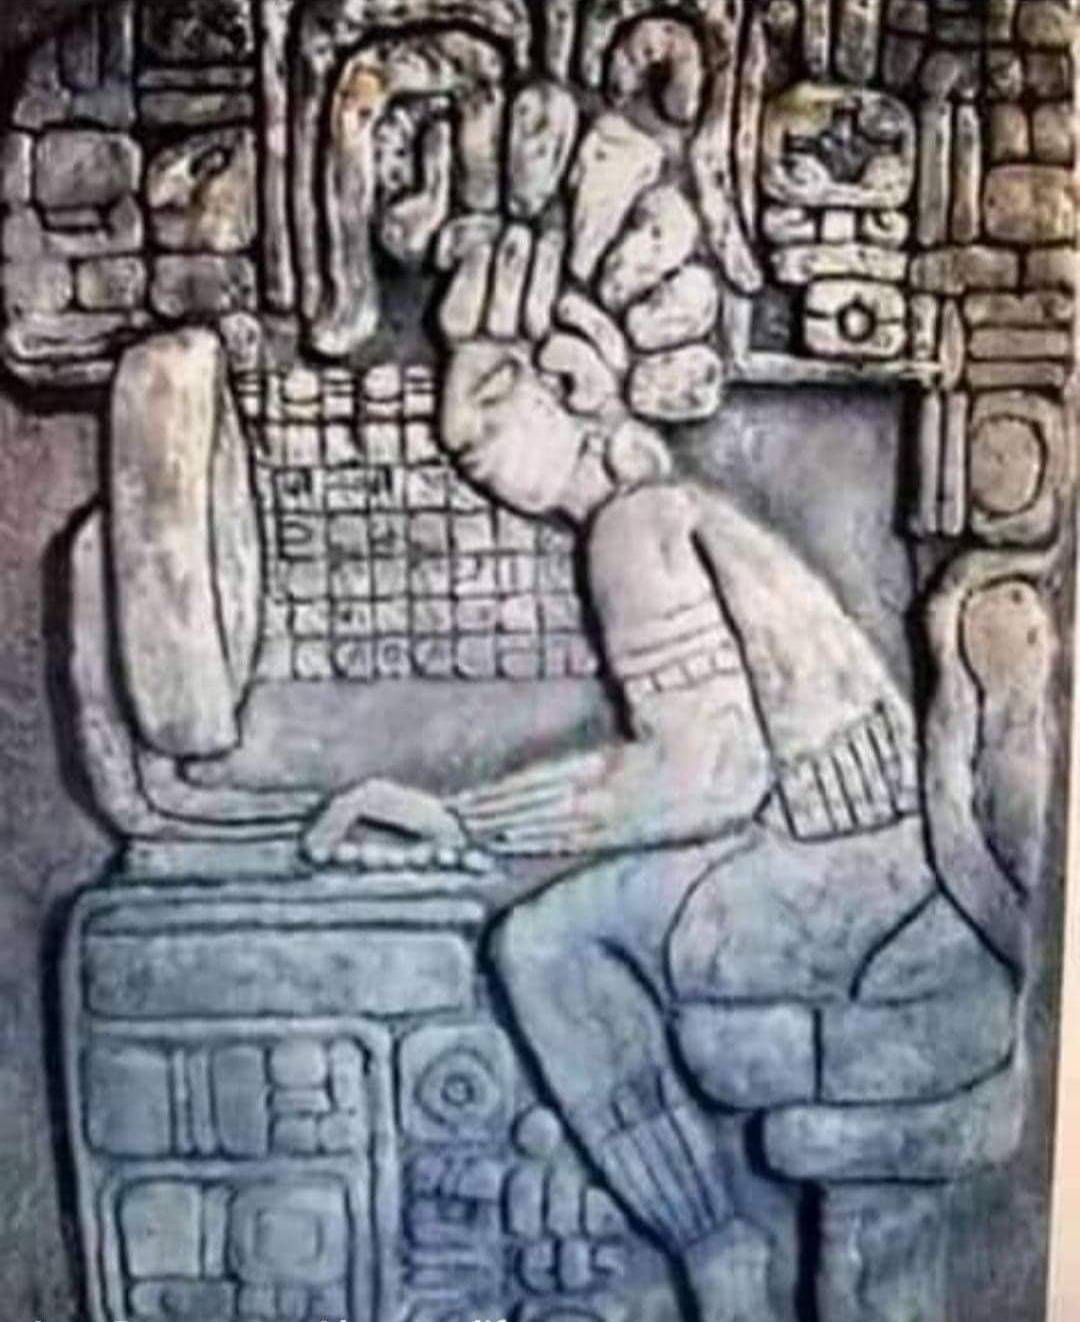 Just a normal Mayan salaryman